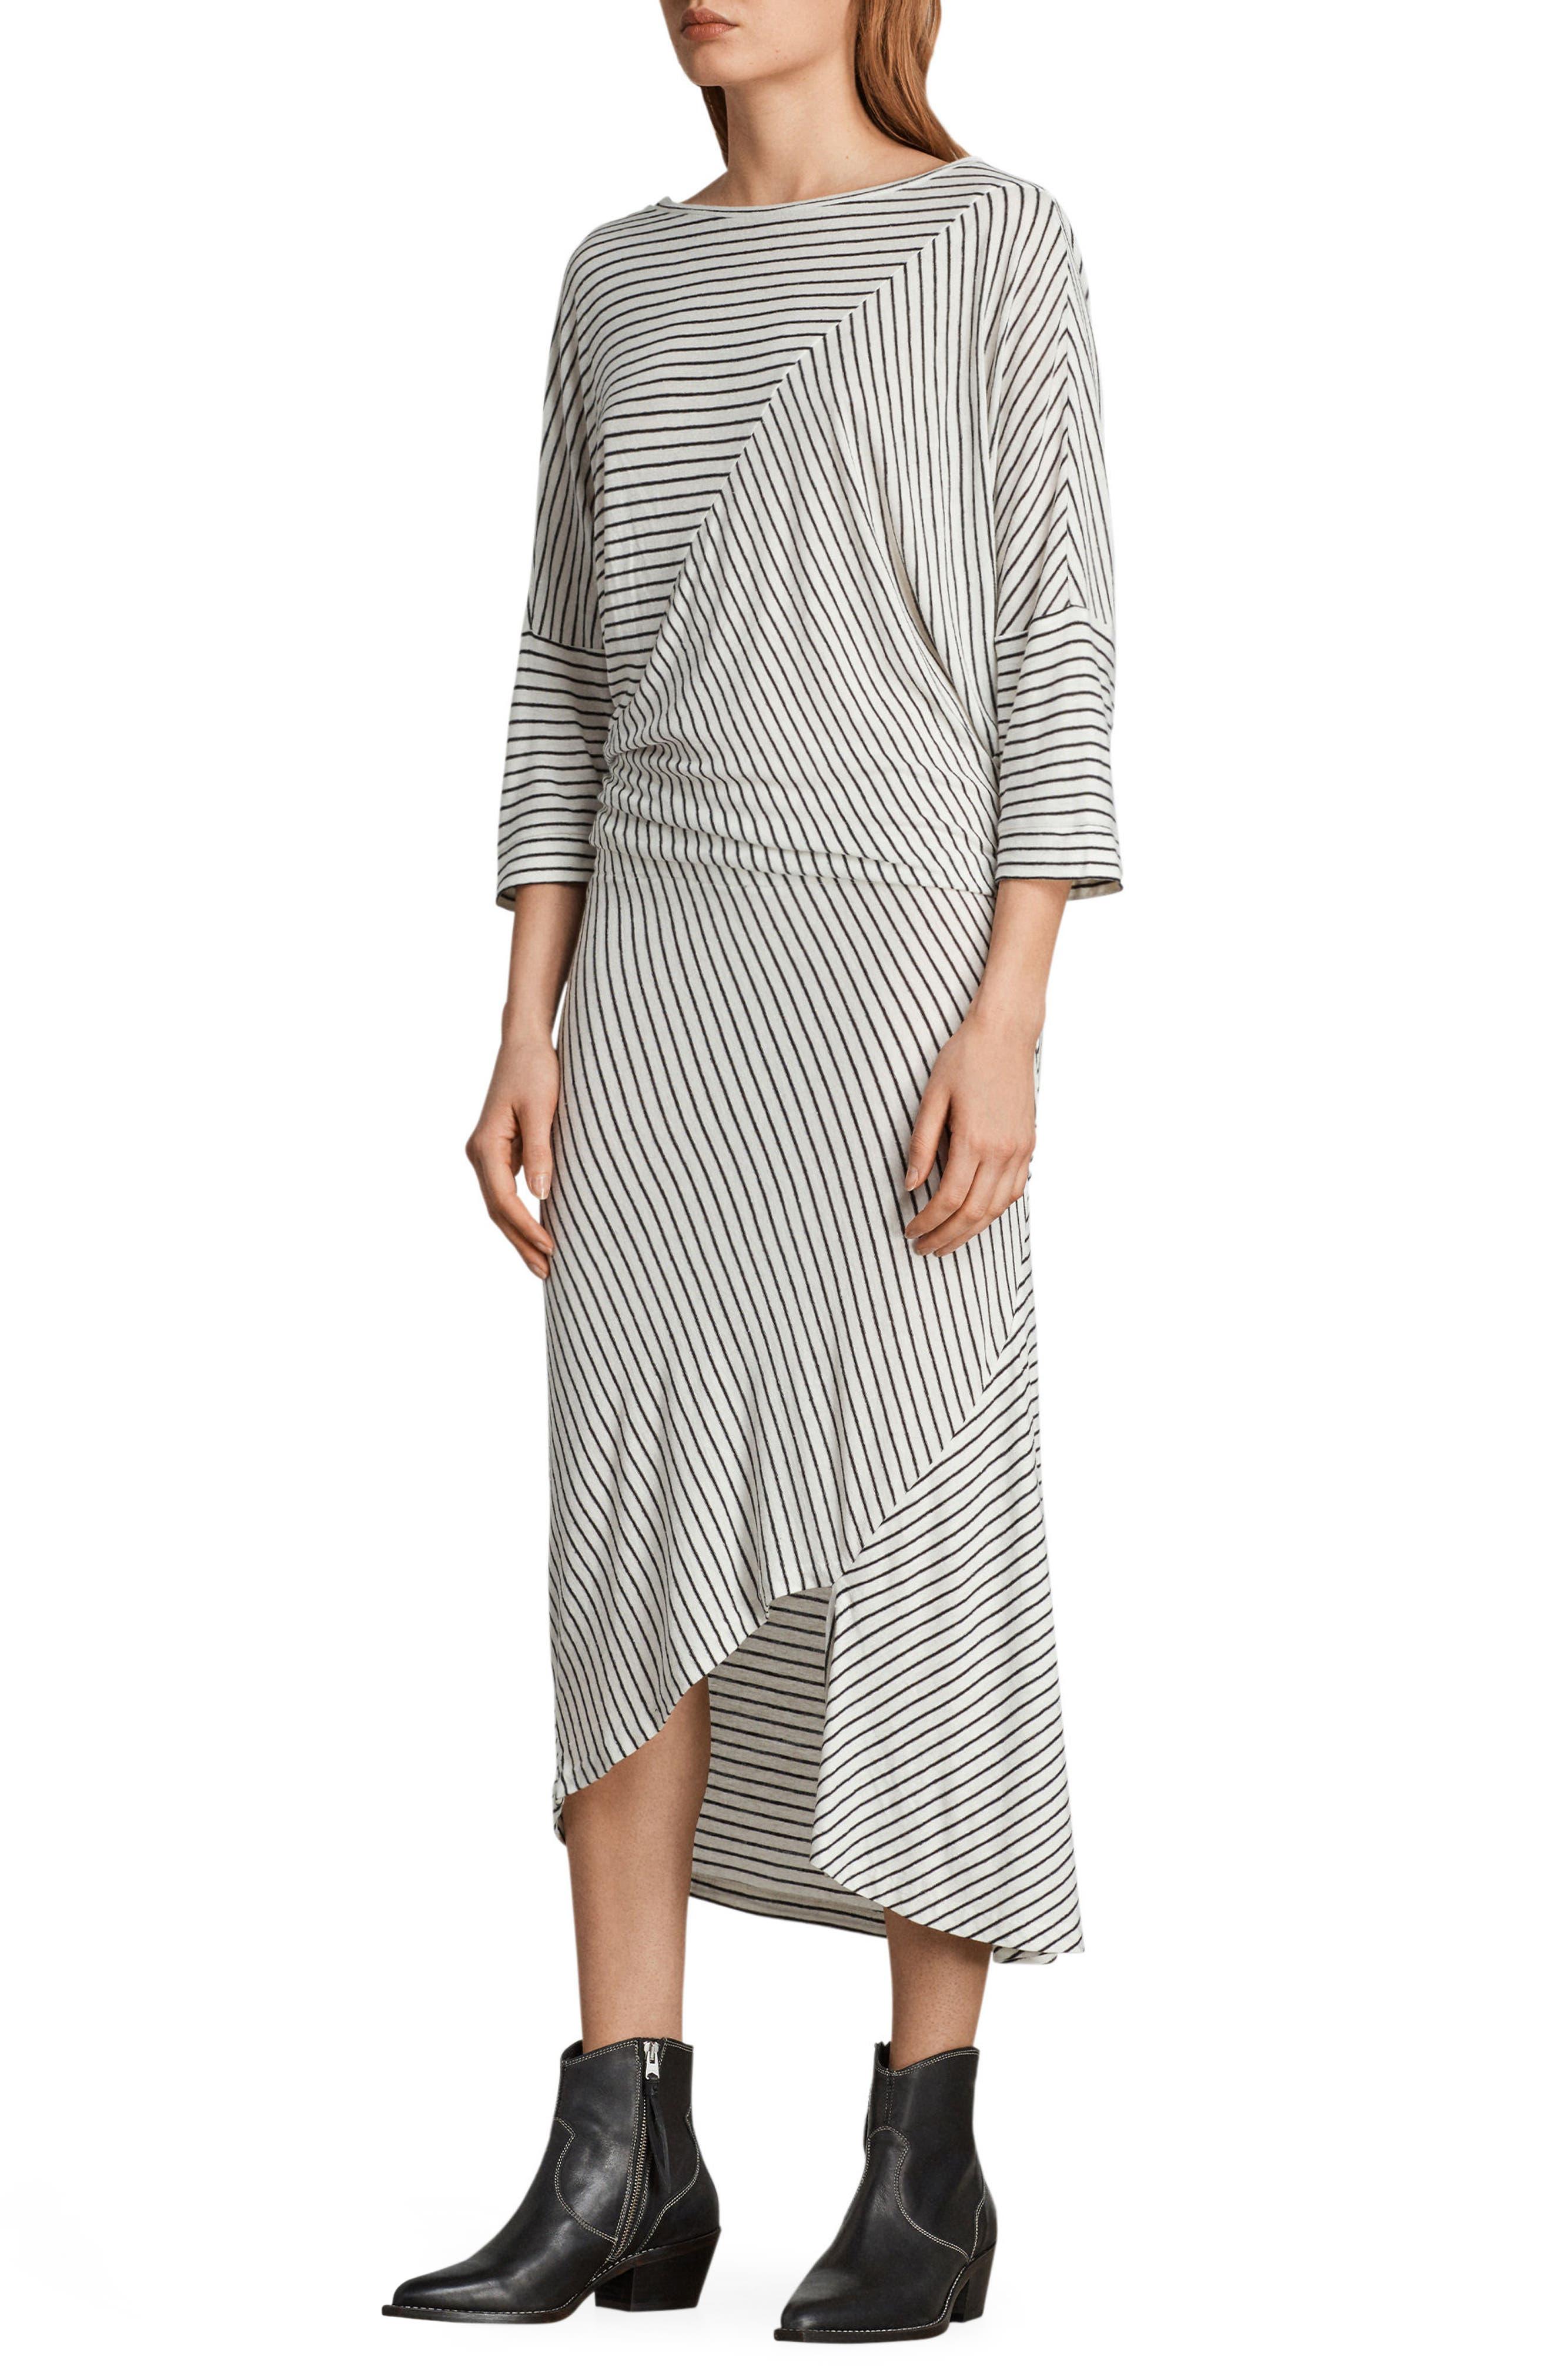 Cadie Stripe Midi Dress,                             Alternate thumbnail 3, color,                             Ecru White/ Black